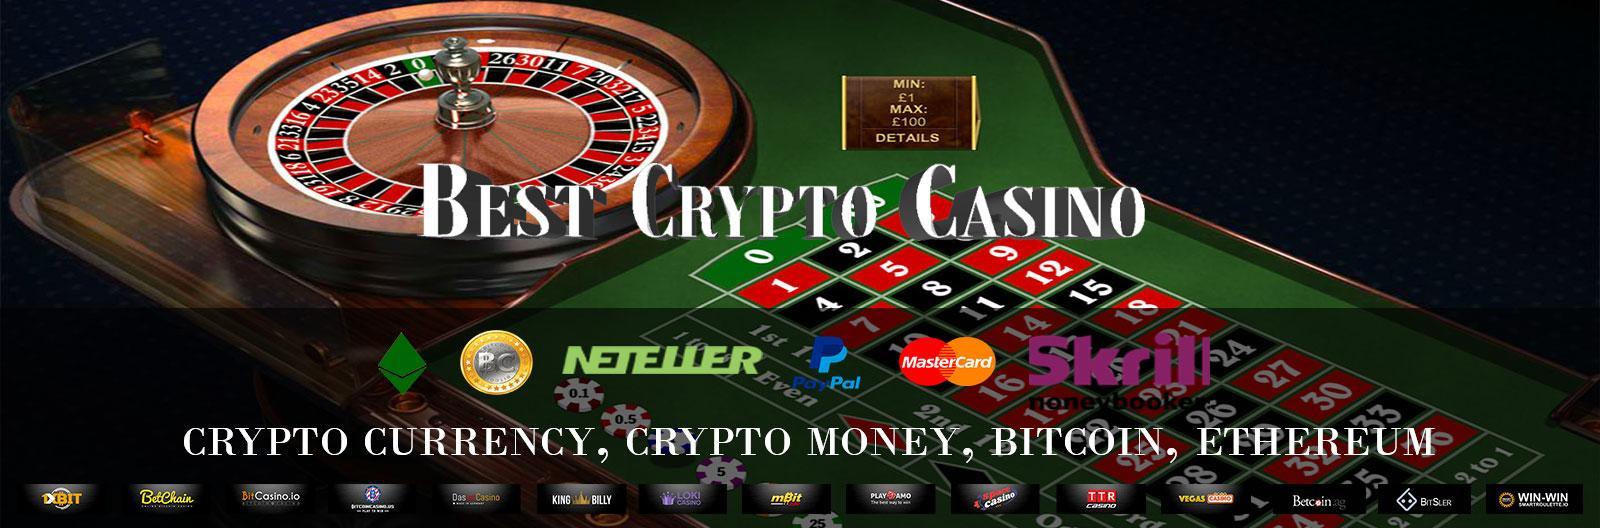 Online bitcoin casino 0900